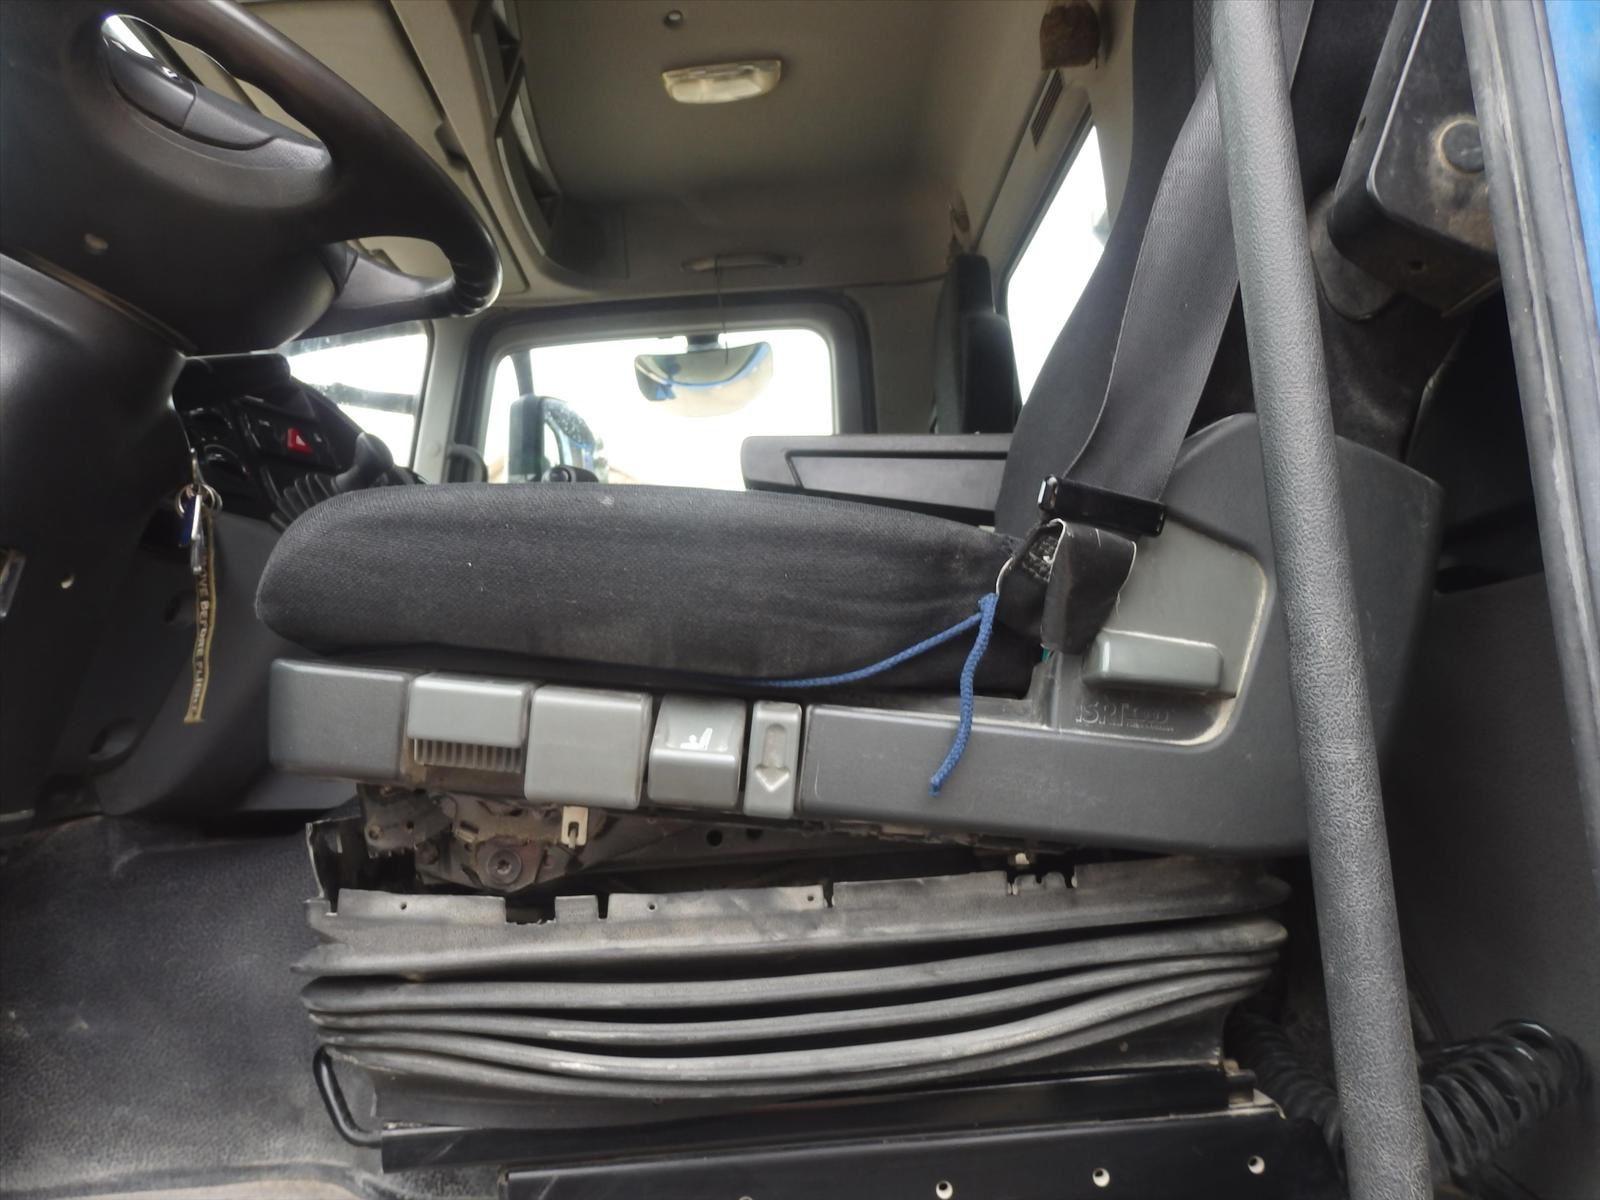 Camion MERCEDES ACTROS 3241 8x4 Benne Tel: 0608066192 Pierre BASSAT TRANSCOMM13